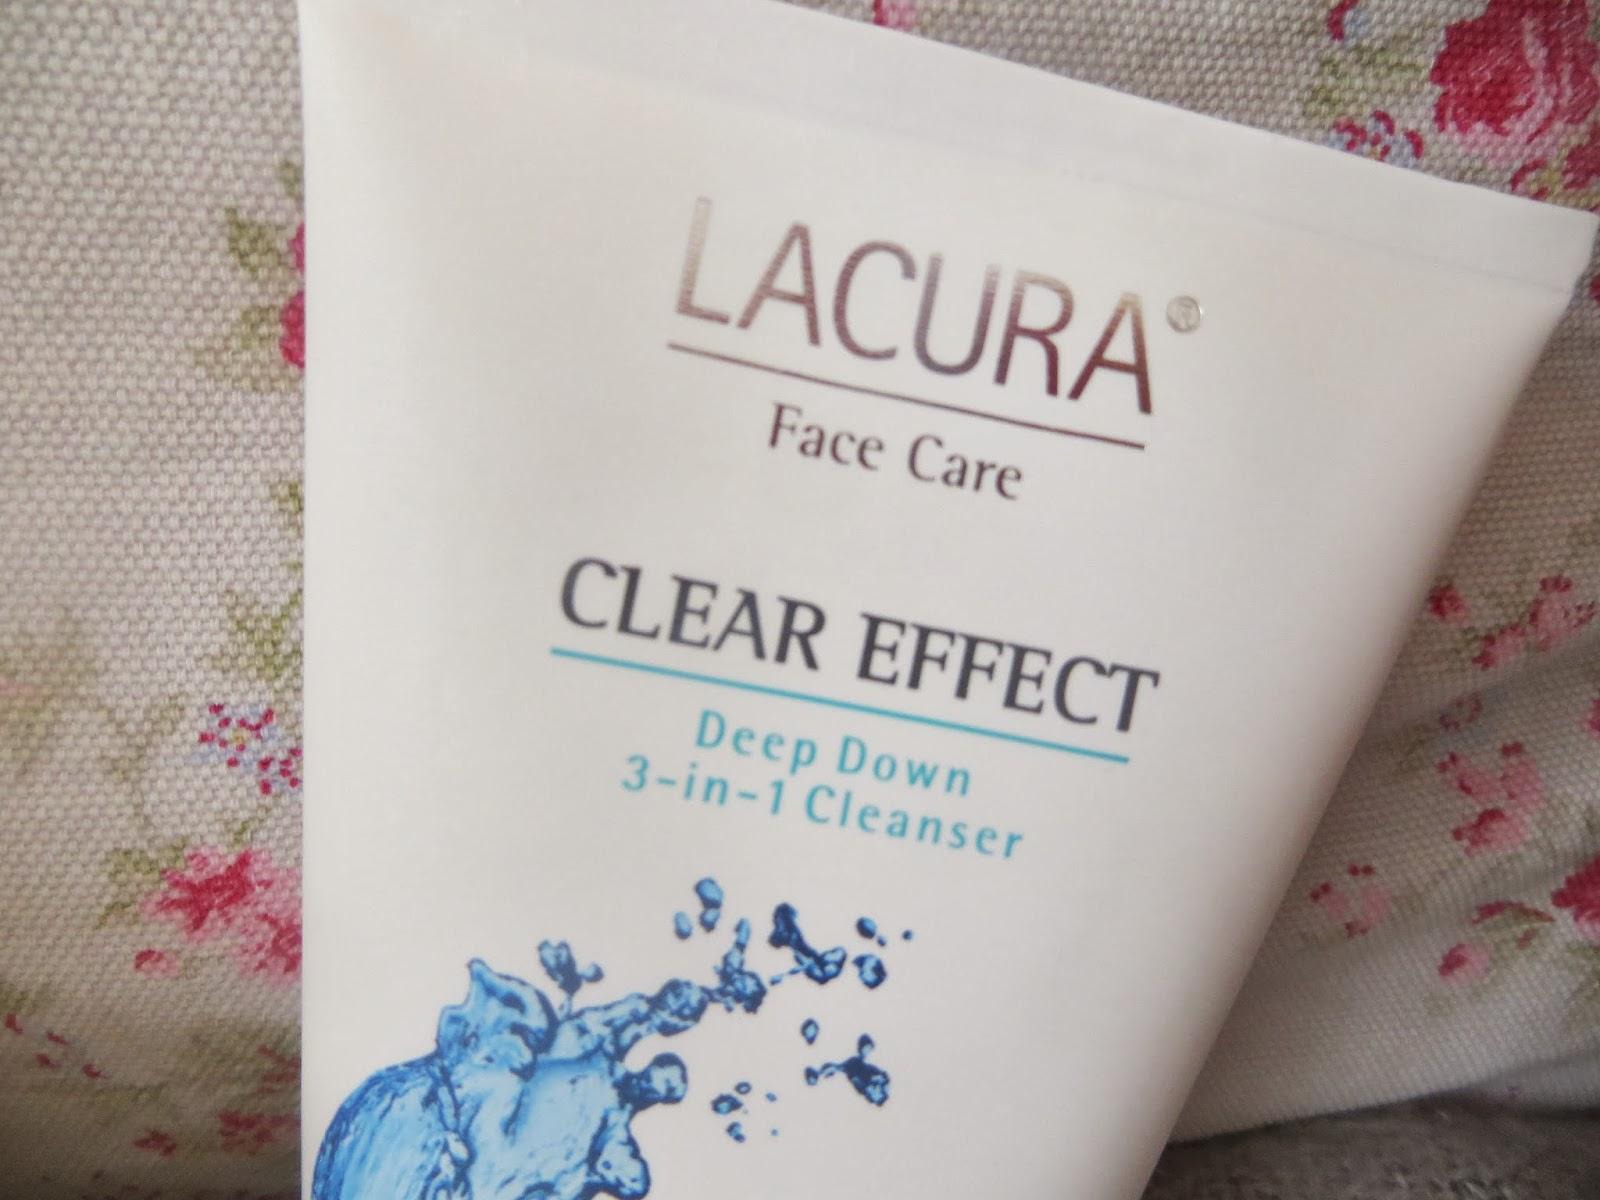 Aldi, Skincare, Review, Cleanser, Moisturiser, Cheap, Bargain, Spotty skin, Oily, Magnolia, BioEcolia, Pretty, Skin, Face mask, Gel wash, Exfoliator